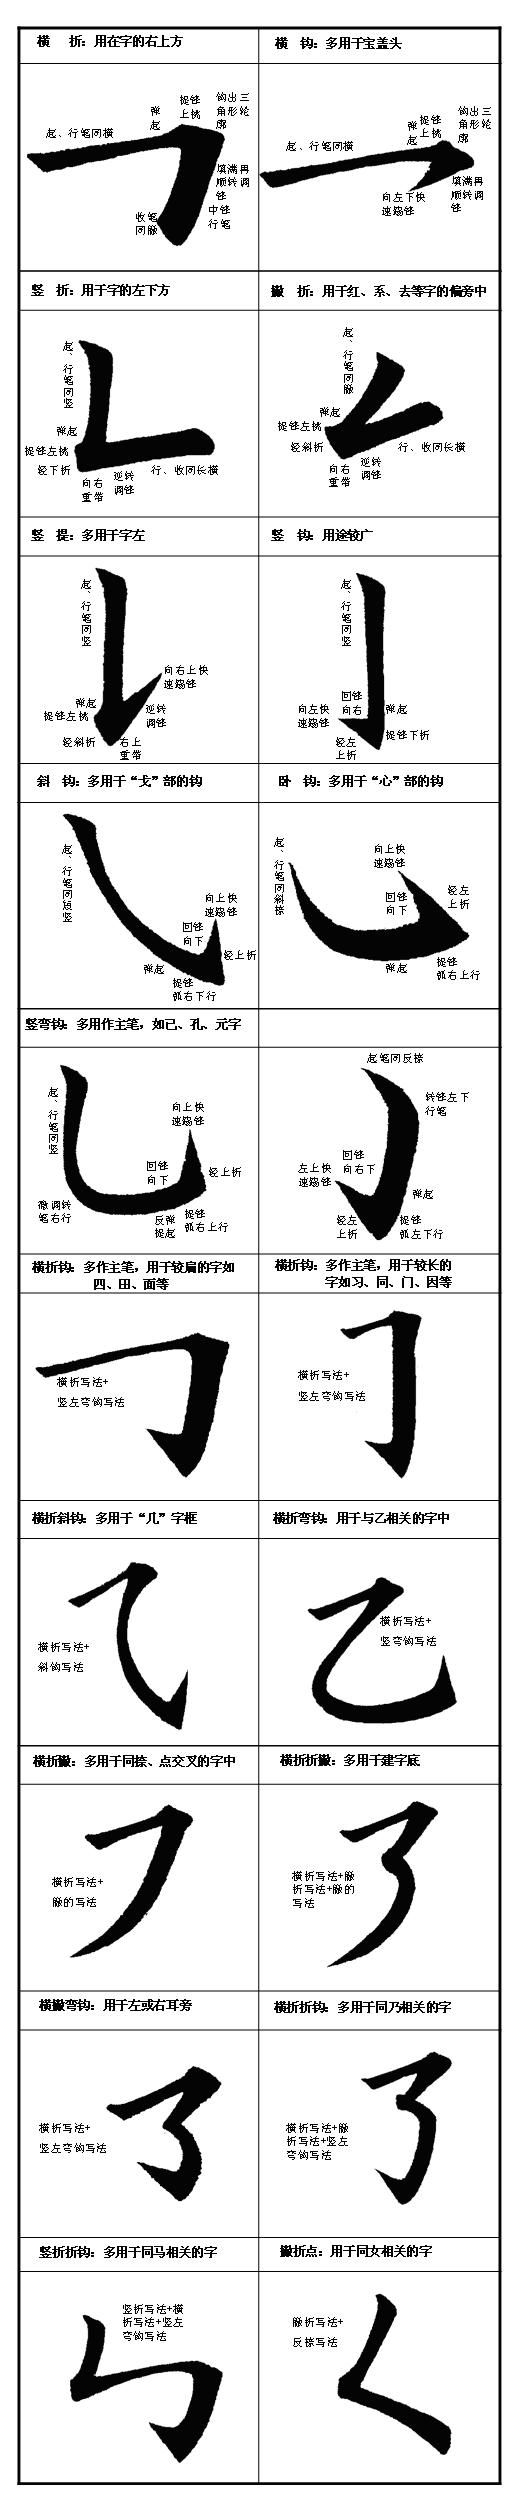 Réguliers manuels scénario d'introduction 1-- Liu - Le blog de Liu